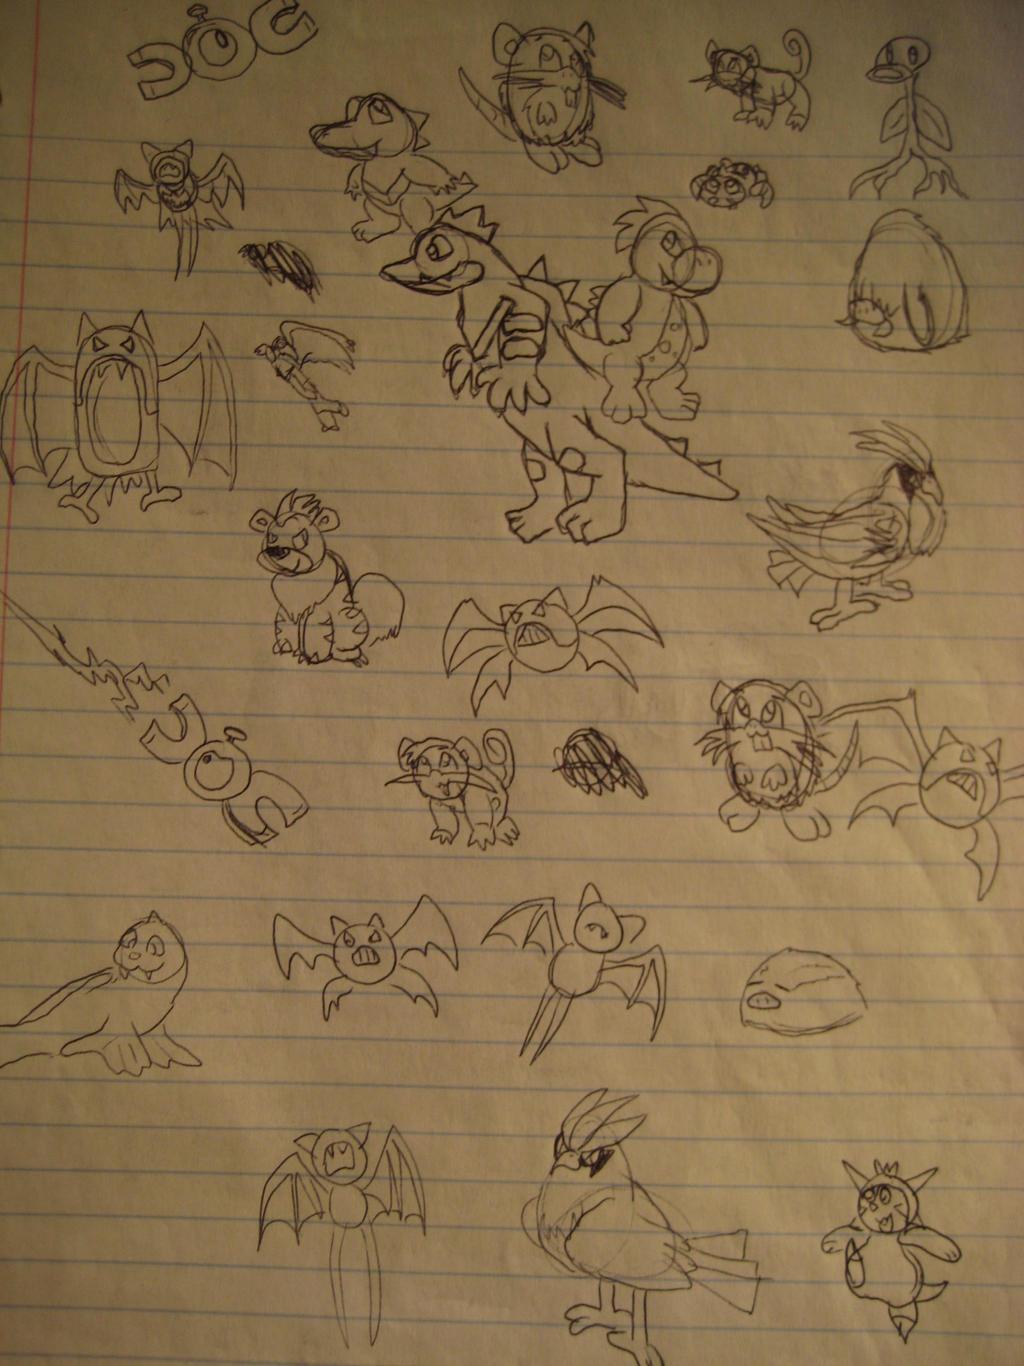 Pokemon Sketch Dump by GECKO-Nuzlockes